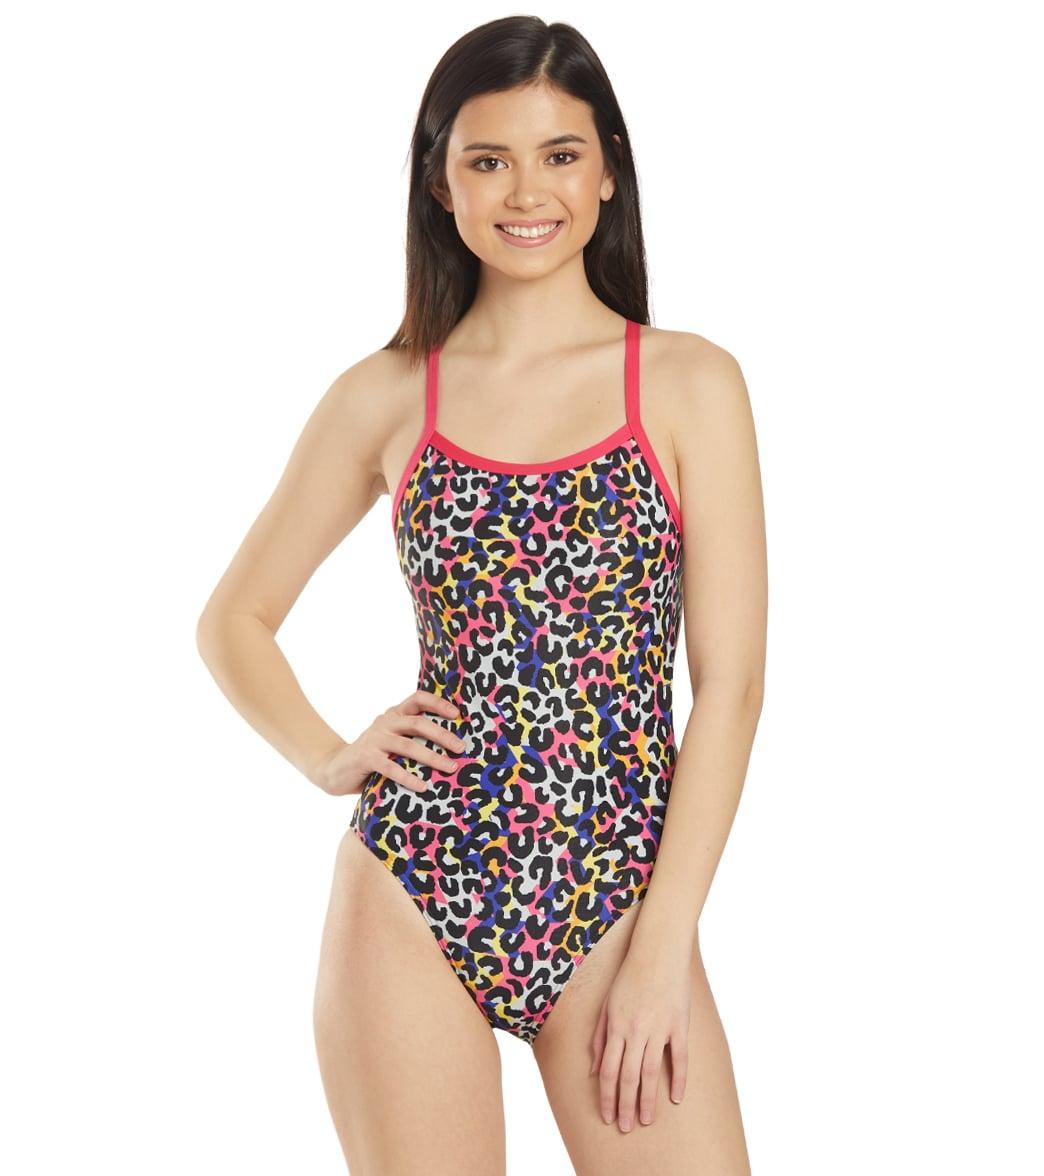 Arena Women's Cheetah Heat Challenge Back One Piece Swimsuit